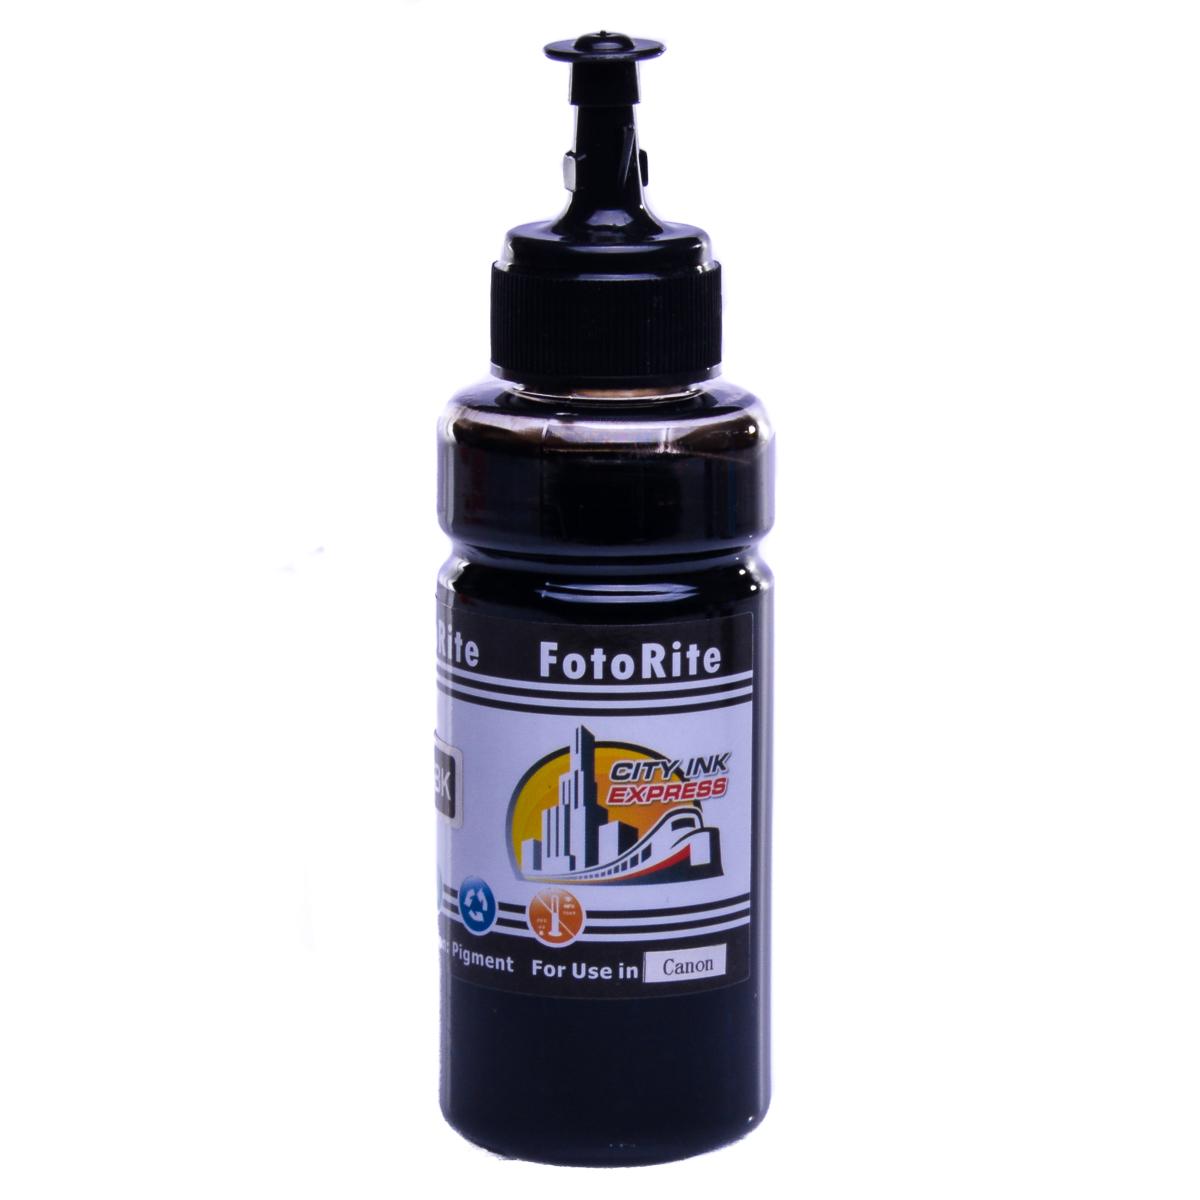 Cheap Pigment Black pigment ink replaces Canon Pixma IP1700 - PG-40 - PG-50